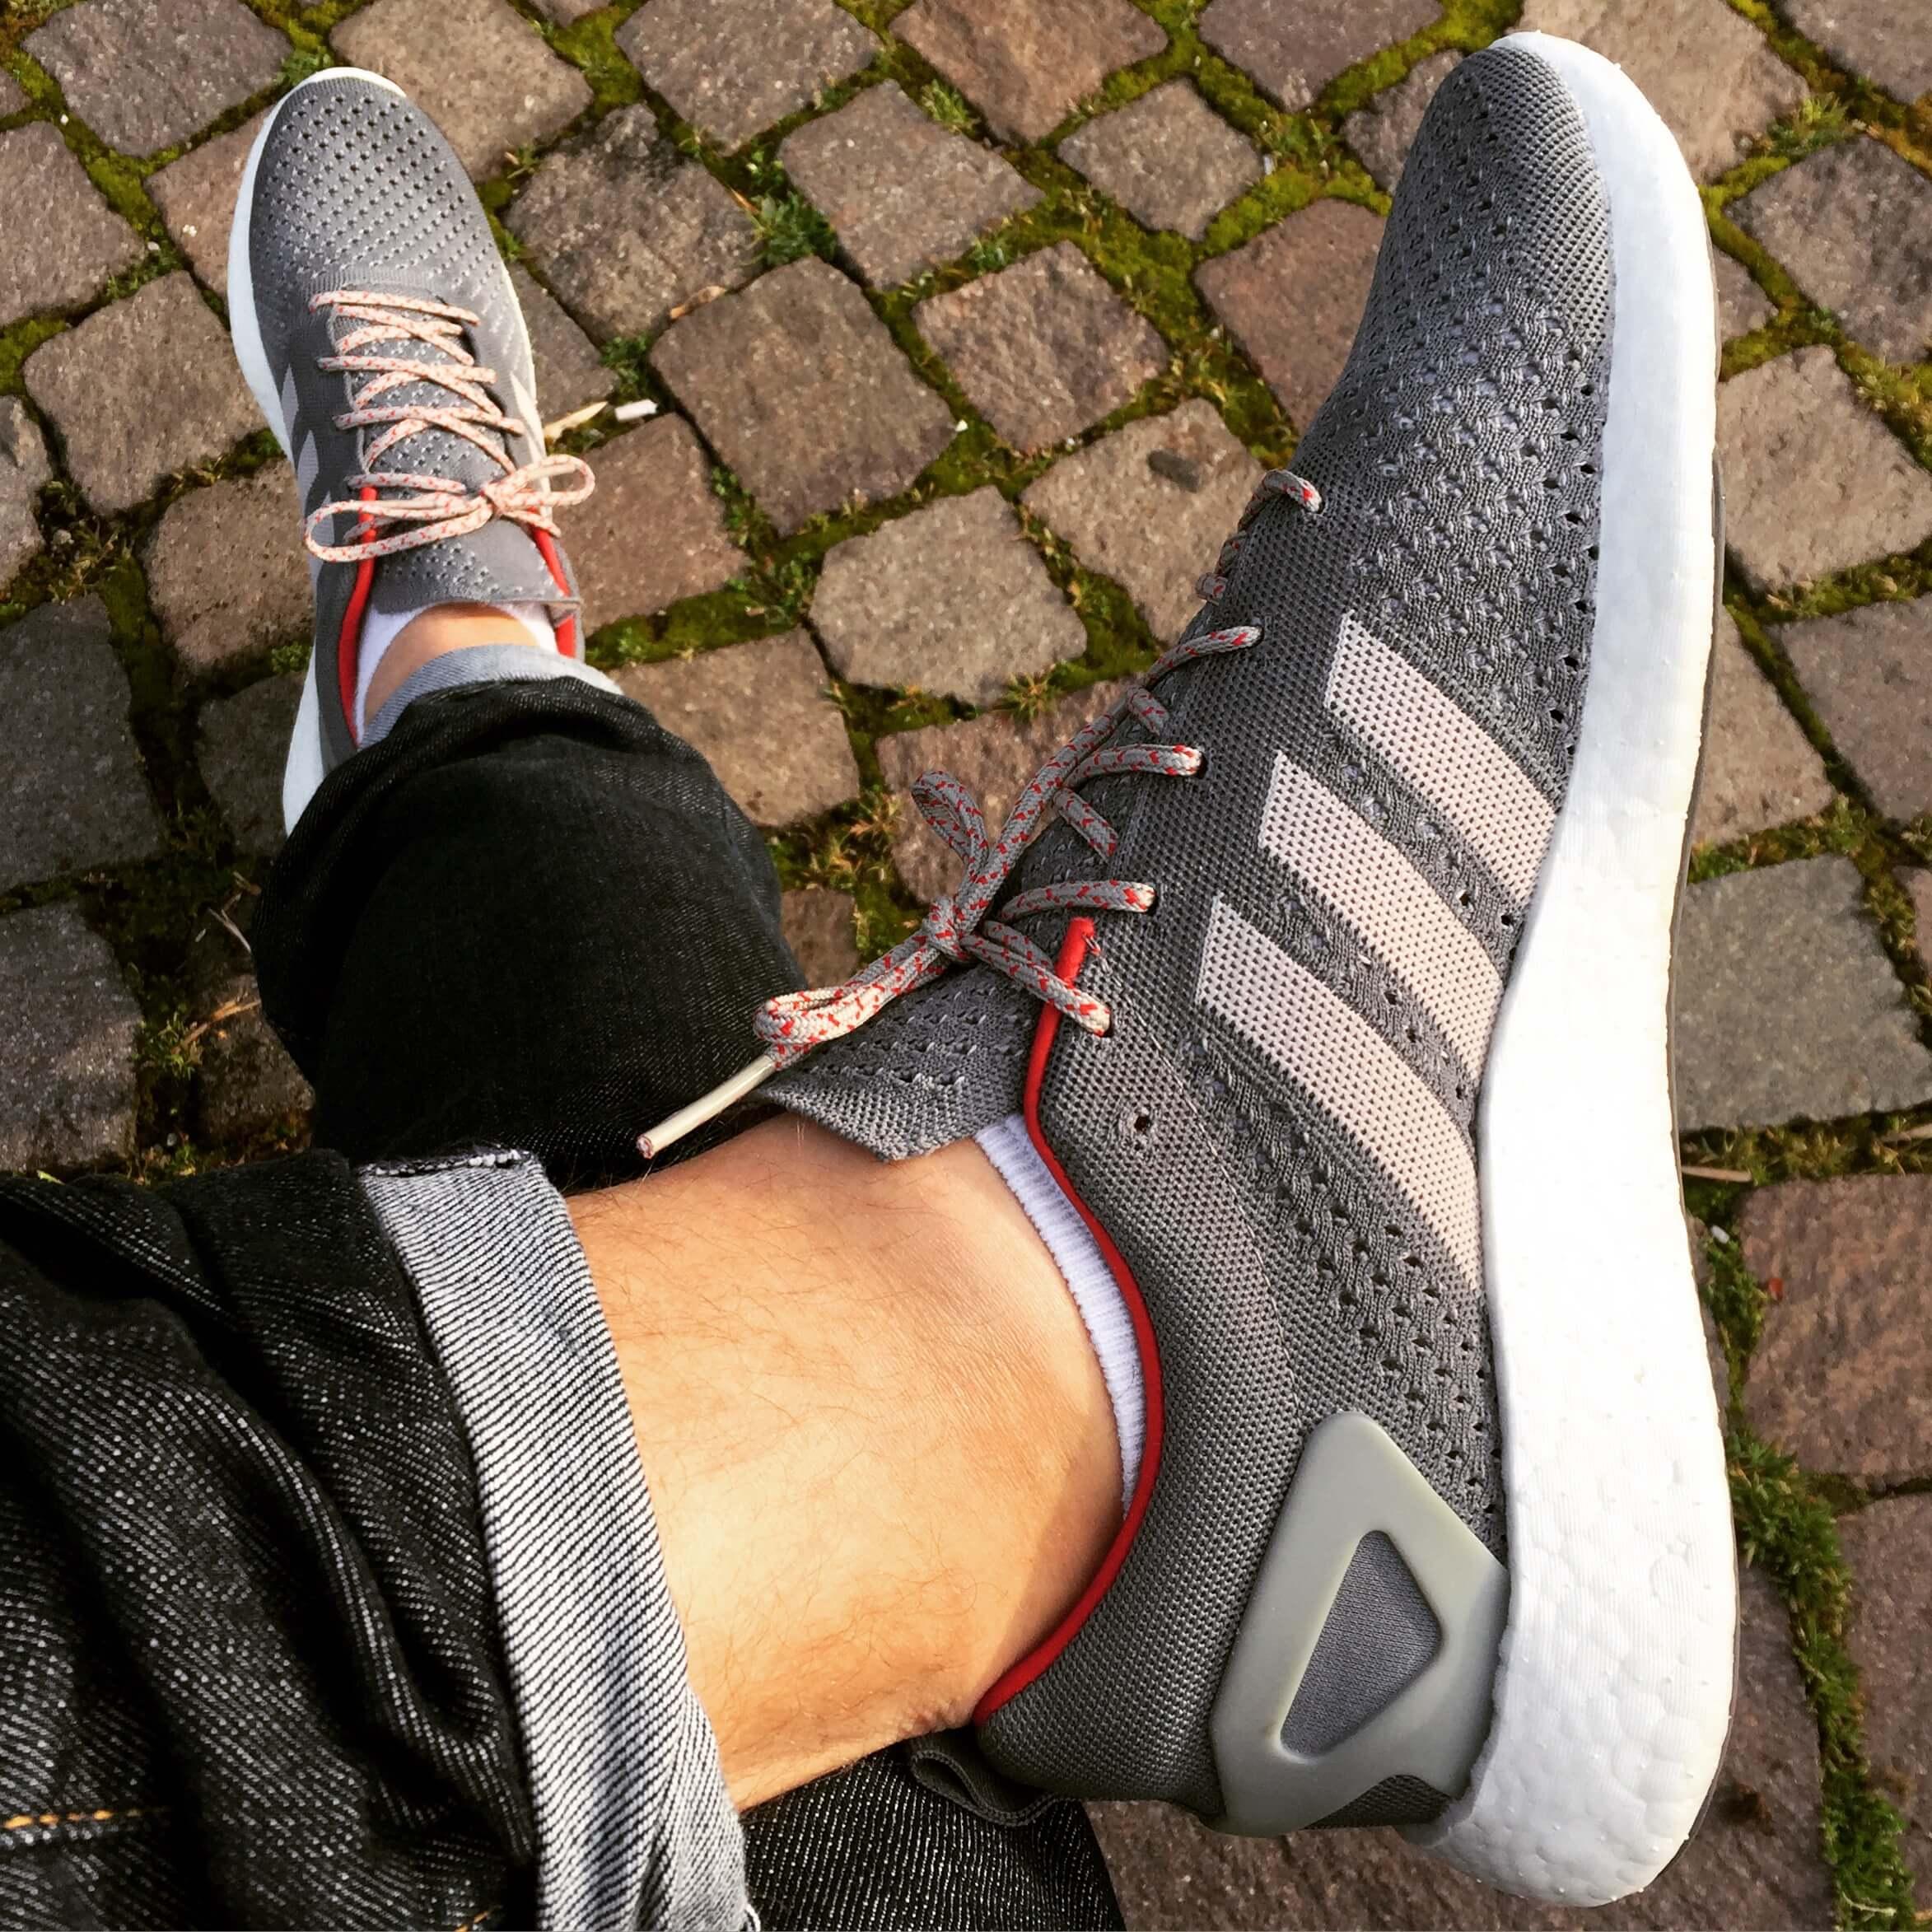 Adidas-Pure-Boost-Primeknit-Top-View-Benstah-Onfeet